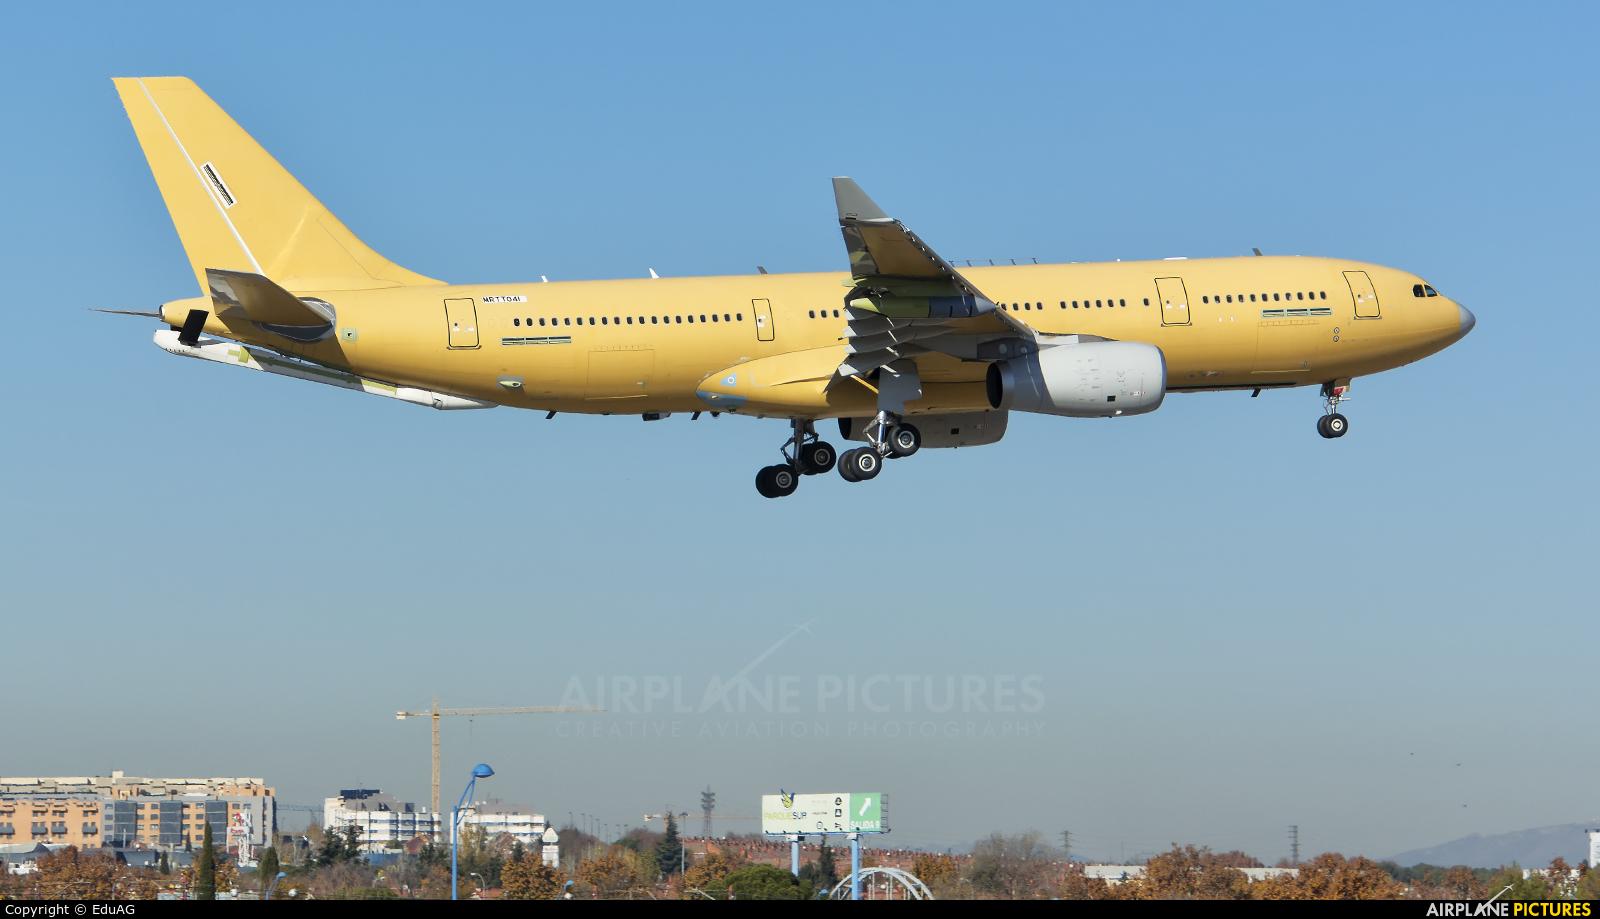 Airbus Military MRTT041 aircraft at Madrid - Getafe